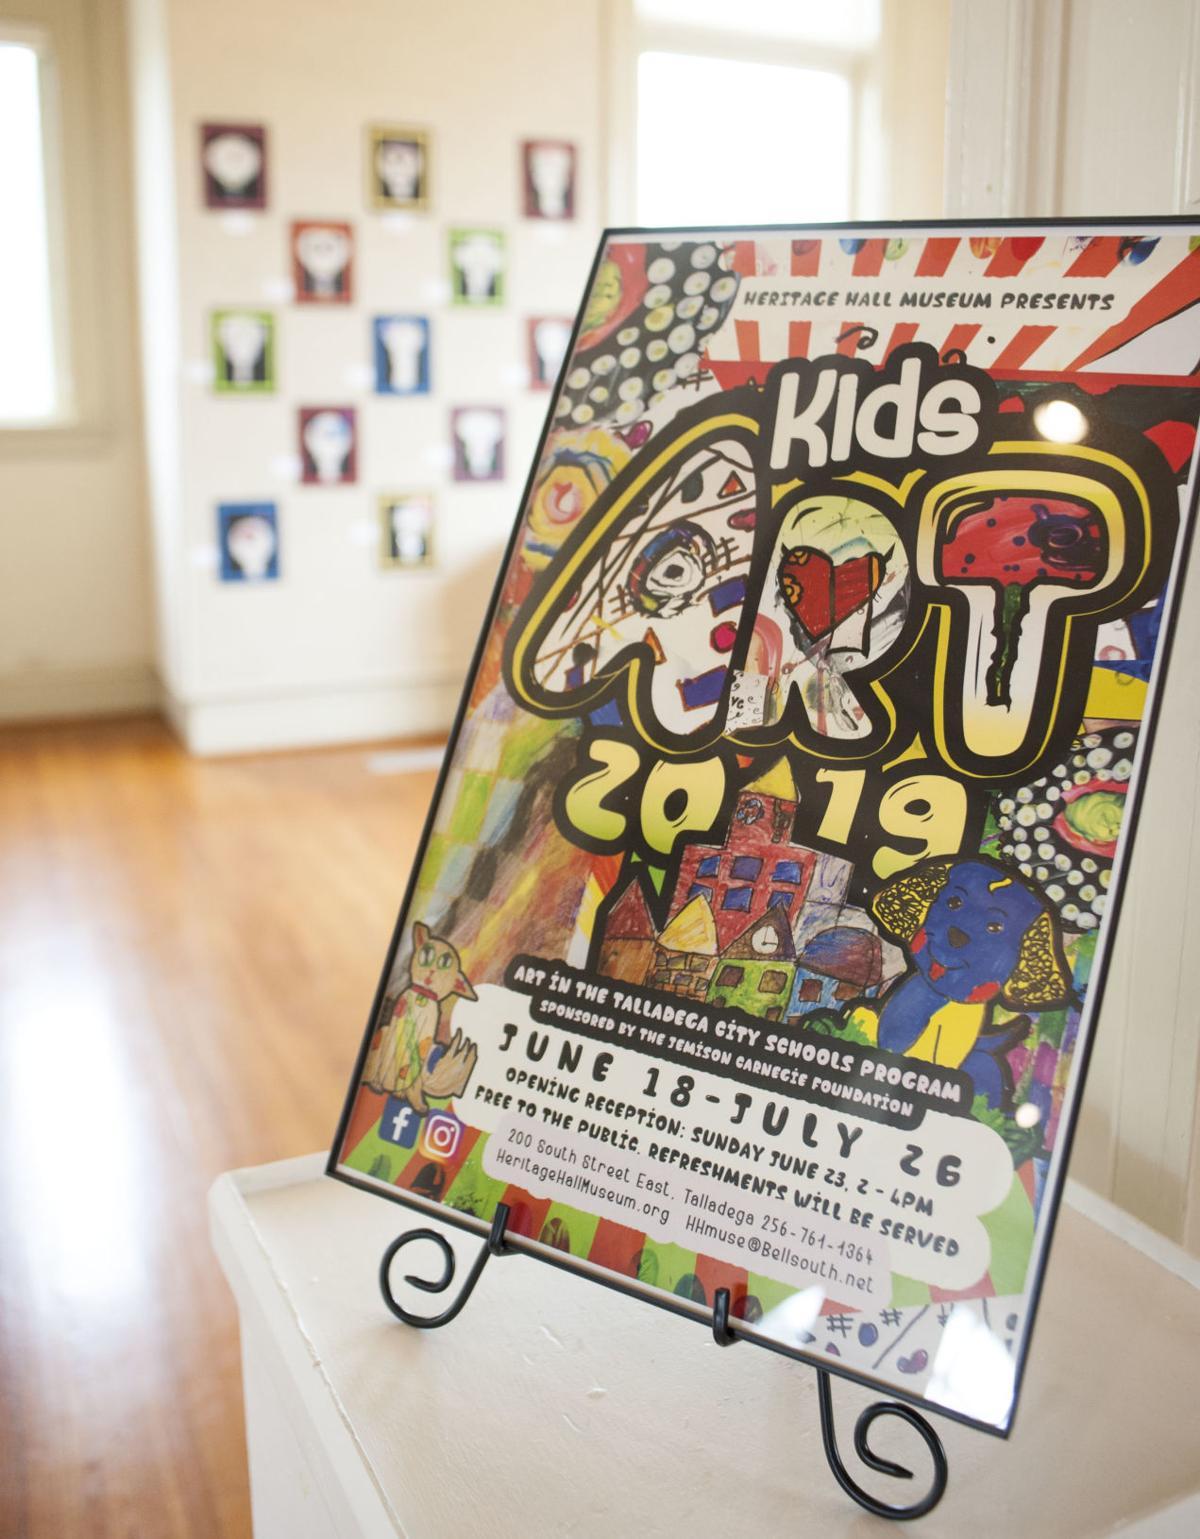 2019 Talladega City Schools Kids Art - 1 tw.jpg